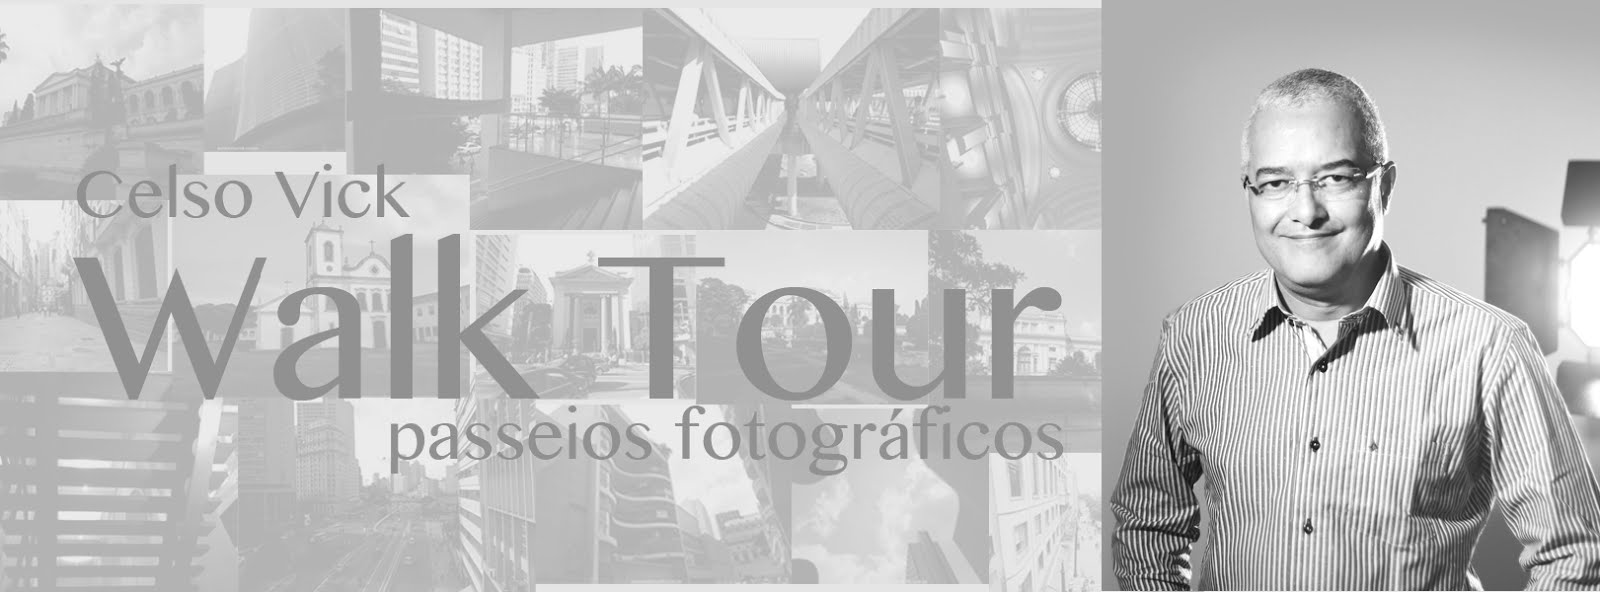 Walk Tour | Passeios Fotográficos